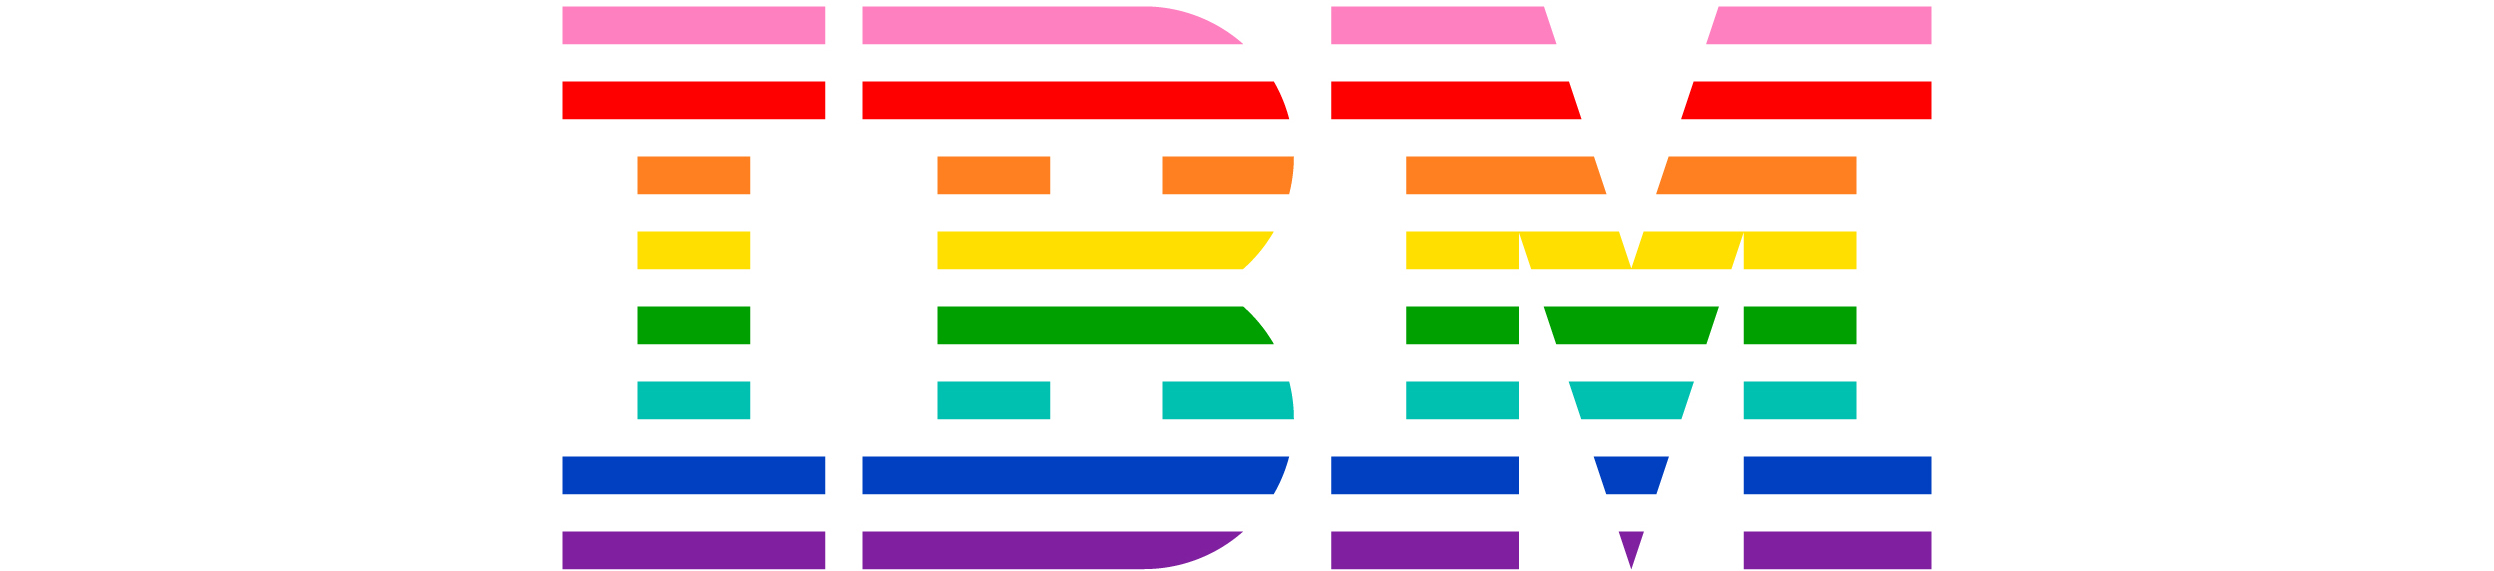 IBM LGBT Logo in multiple colors